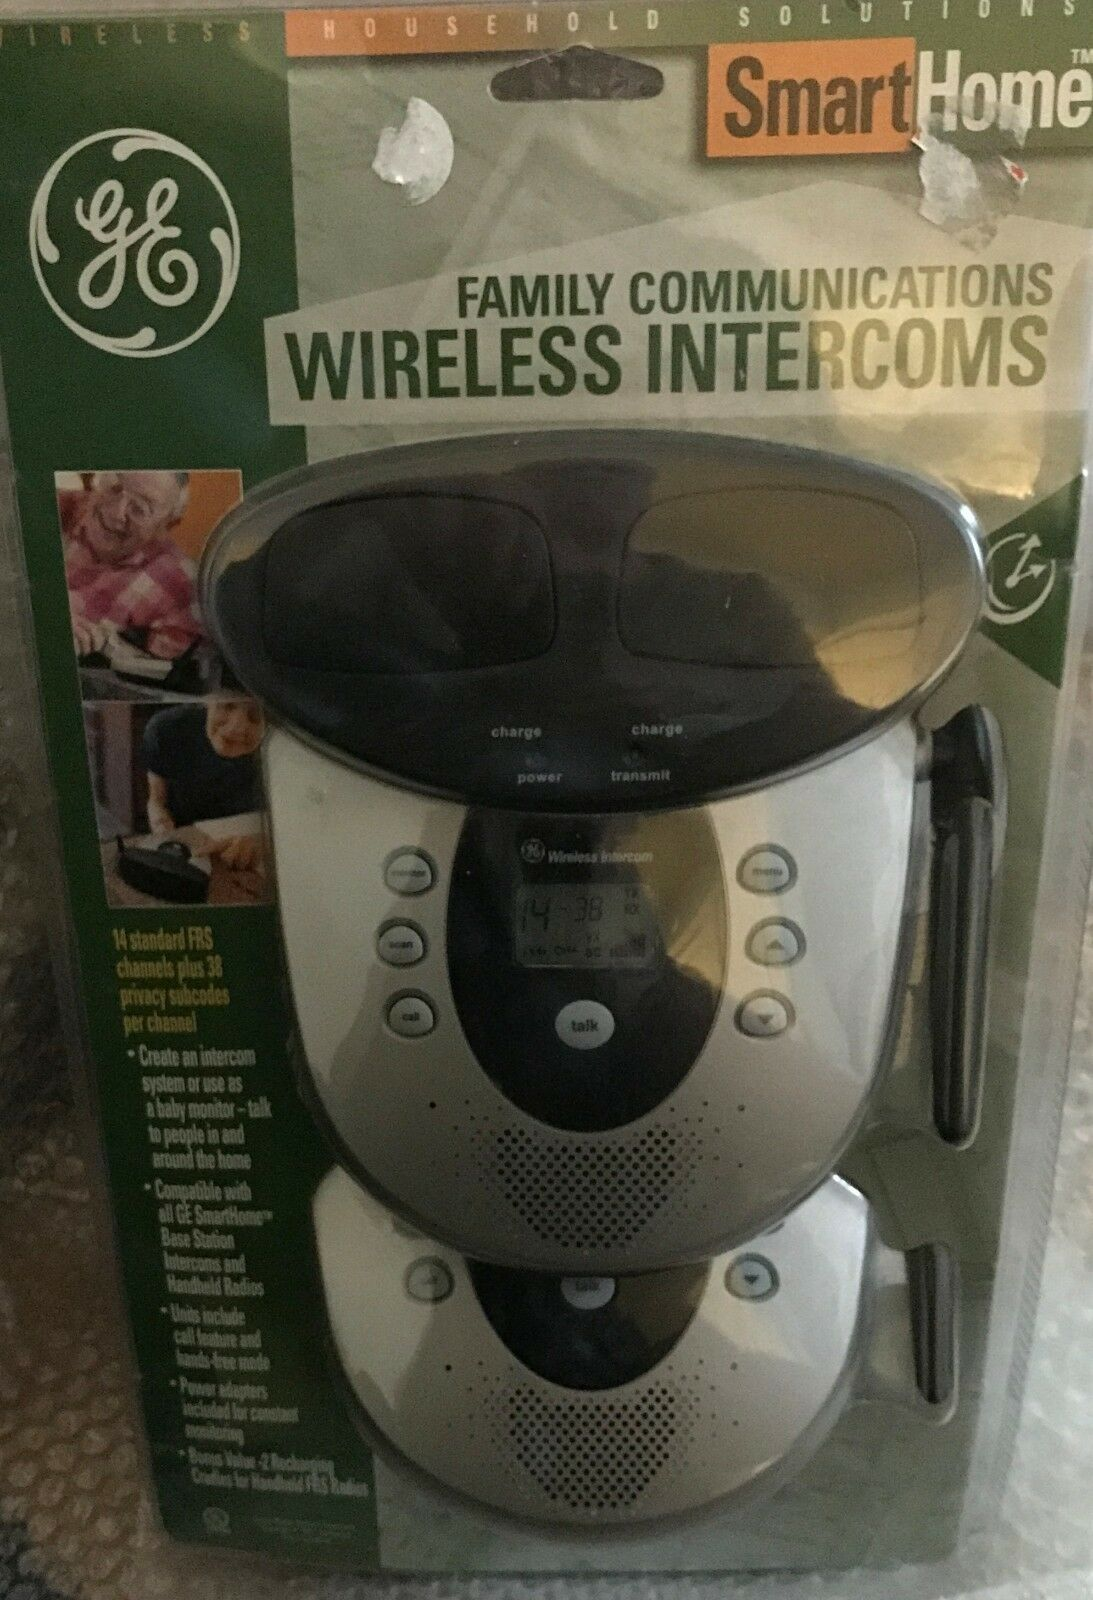 GE SMARTHOME JASHEP51214 Family Communications Wireless Intercoms